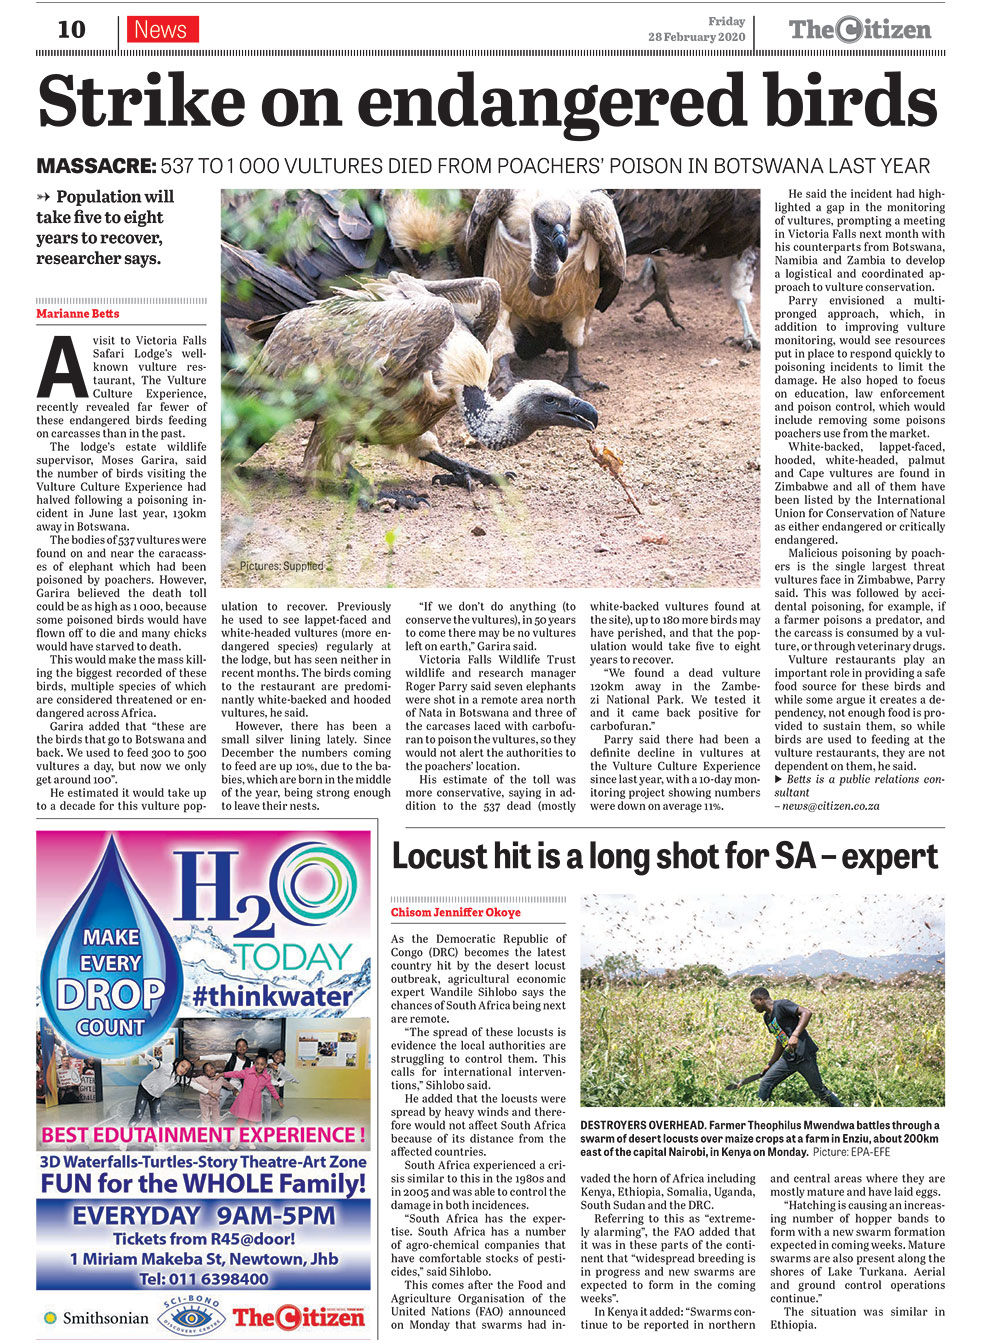 Vic Falls Vultures Poisoned